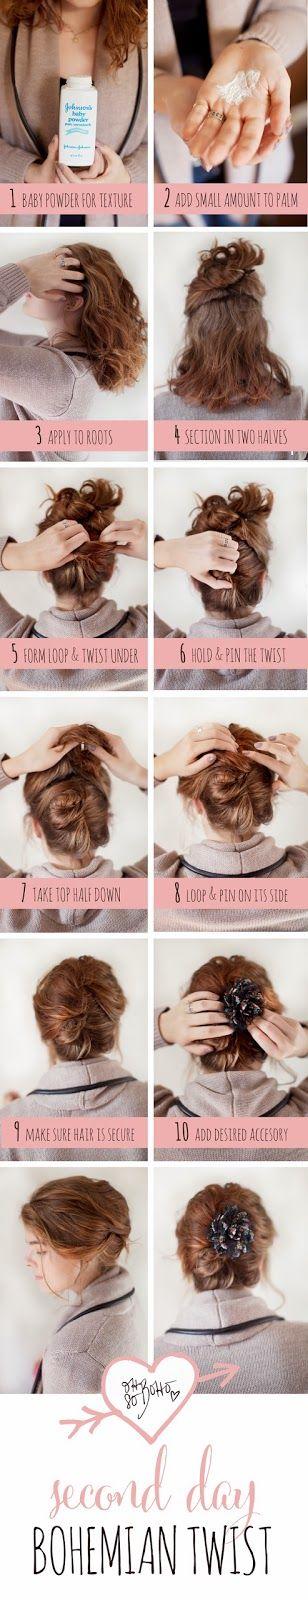 Oh So Boho: Second Day Hair Tutorial: Bohemian Twist